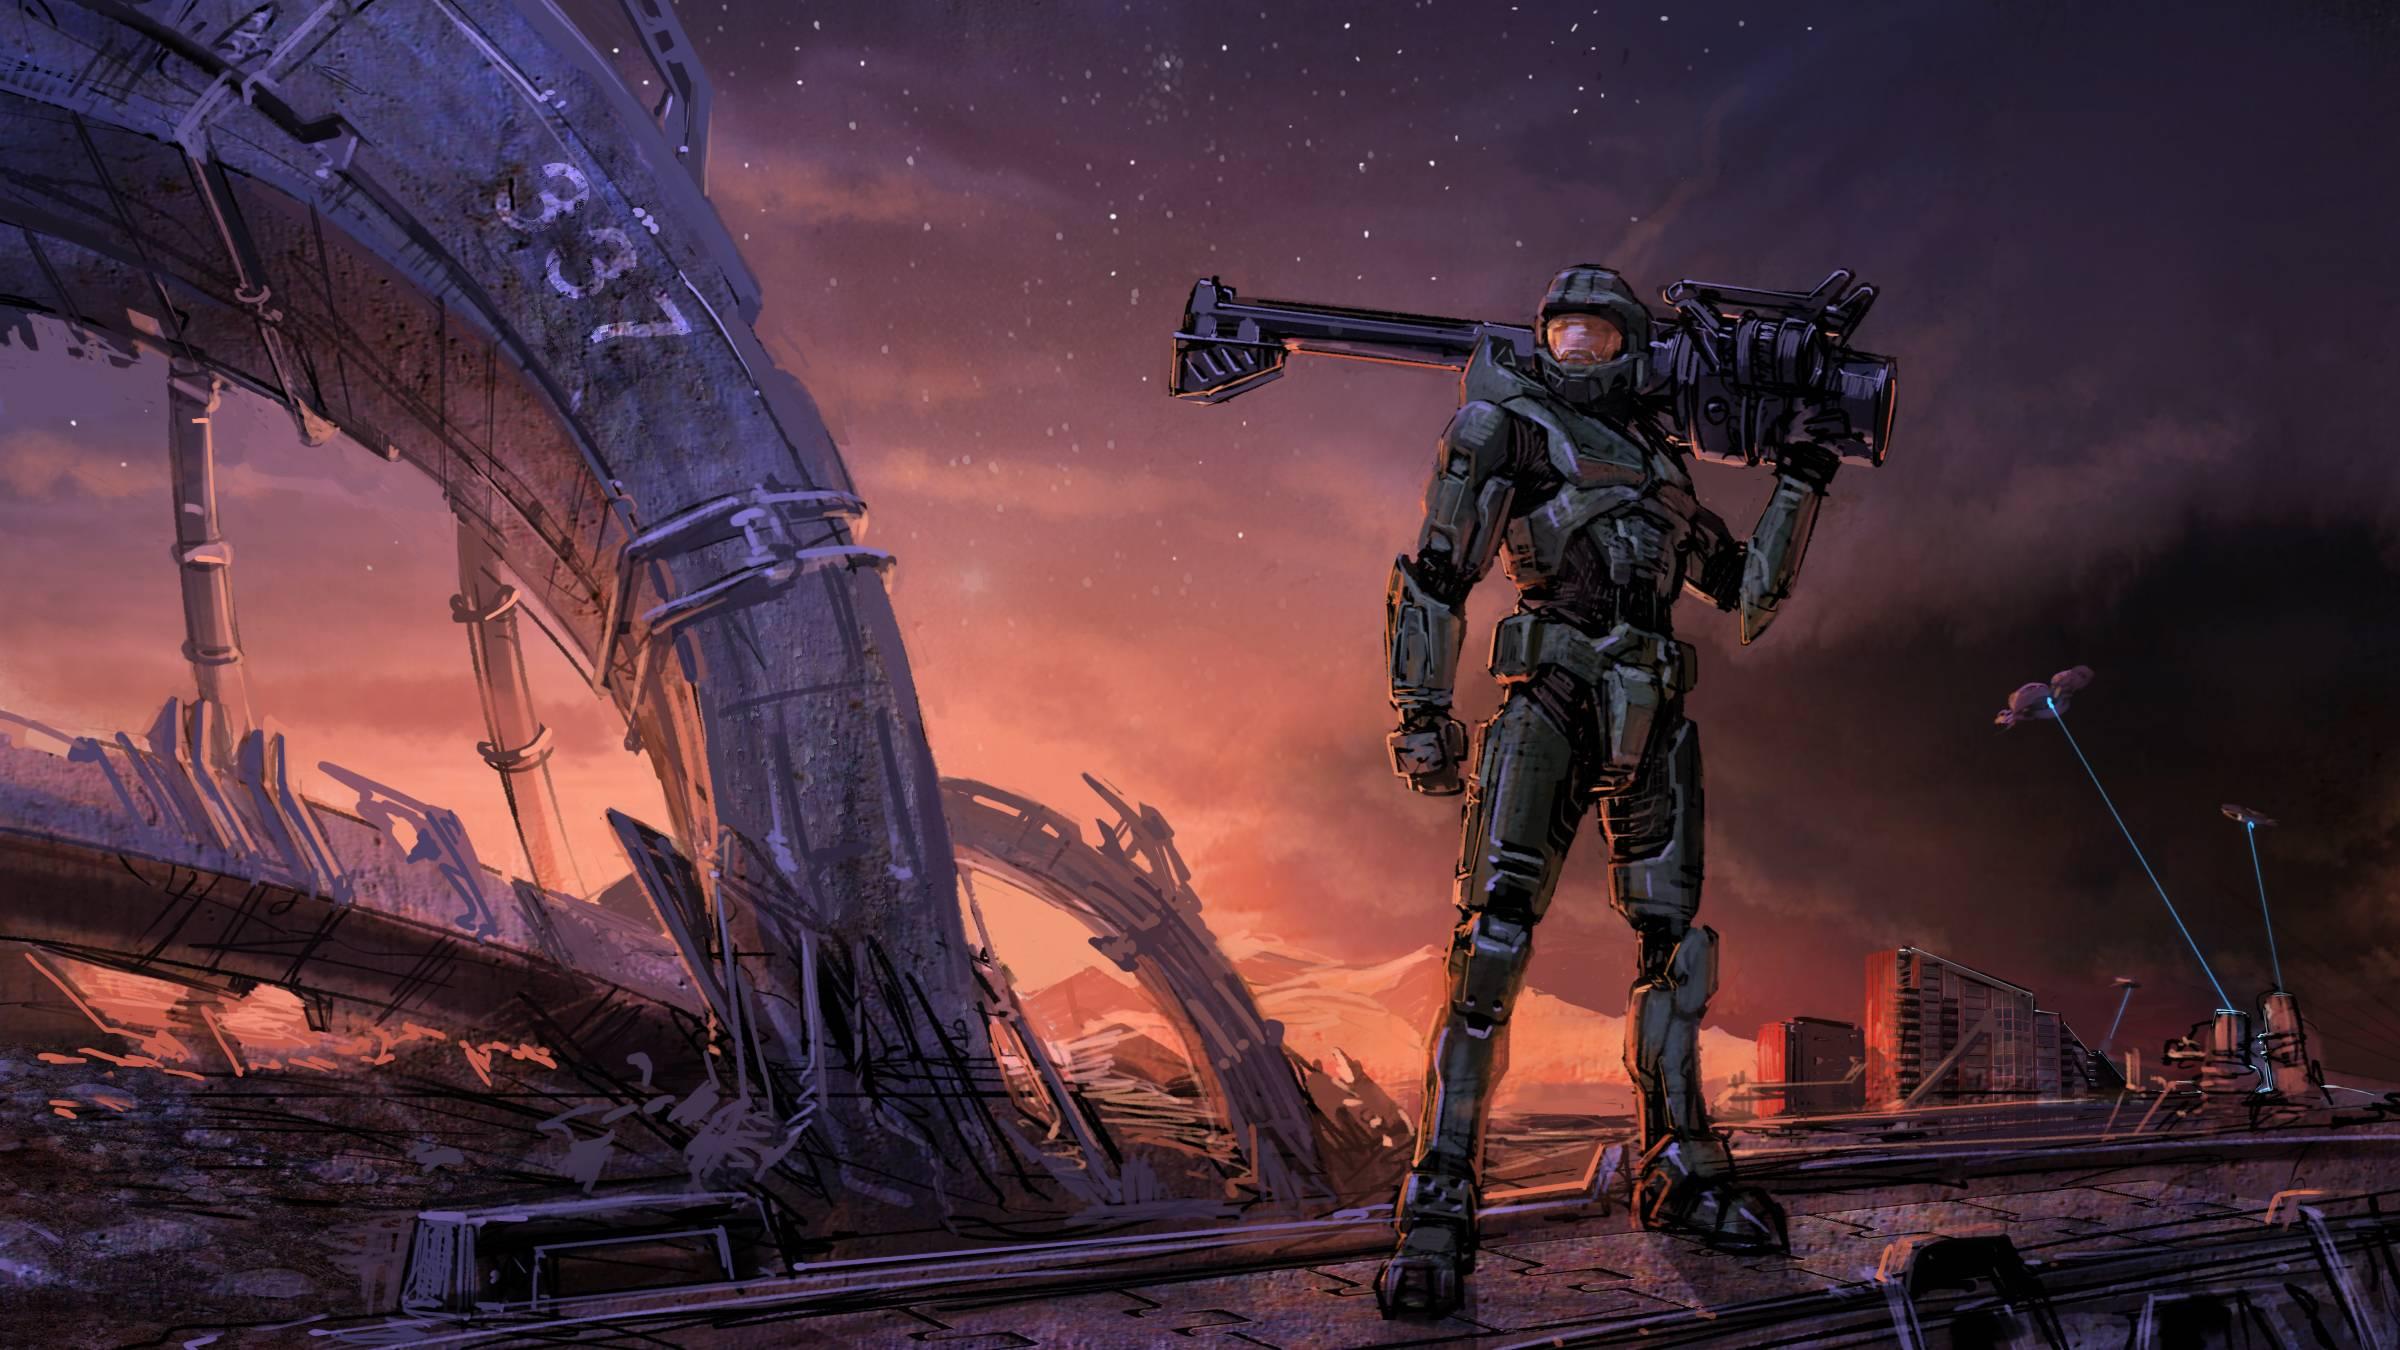 Halo 3 Desktop Backgrounds - Wallpaper Cave